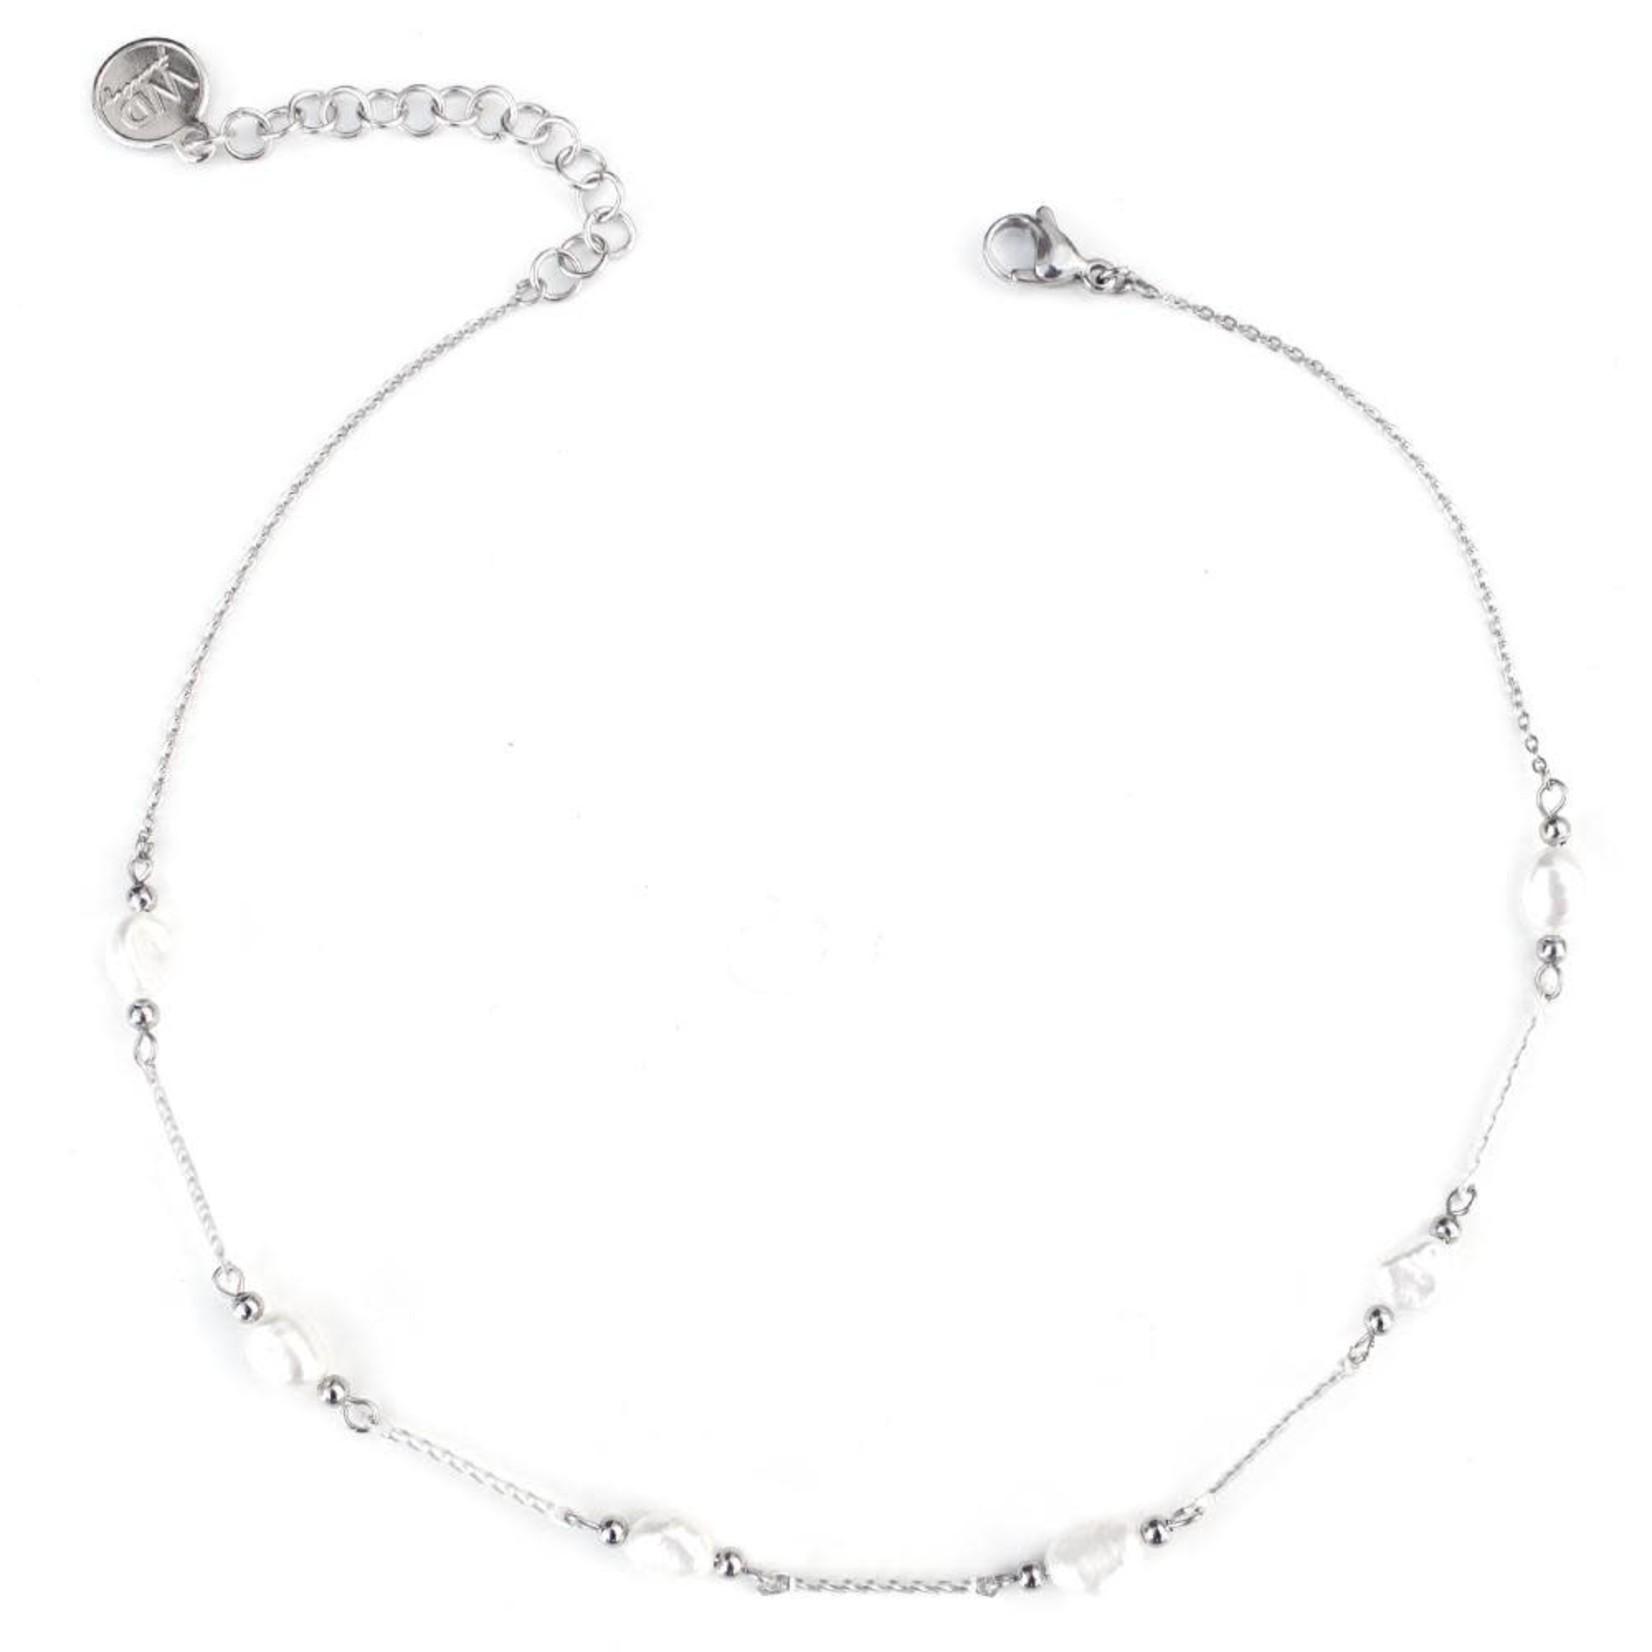 Welldunn jewelry Welldunn collier COCO argent